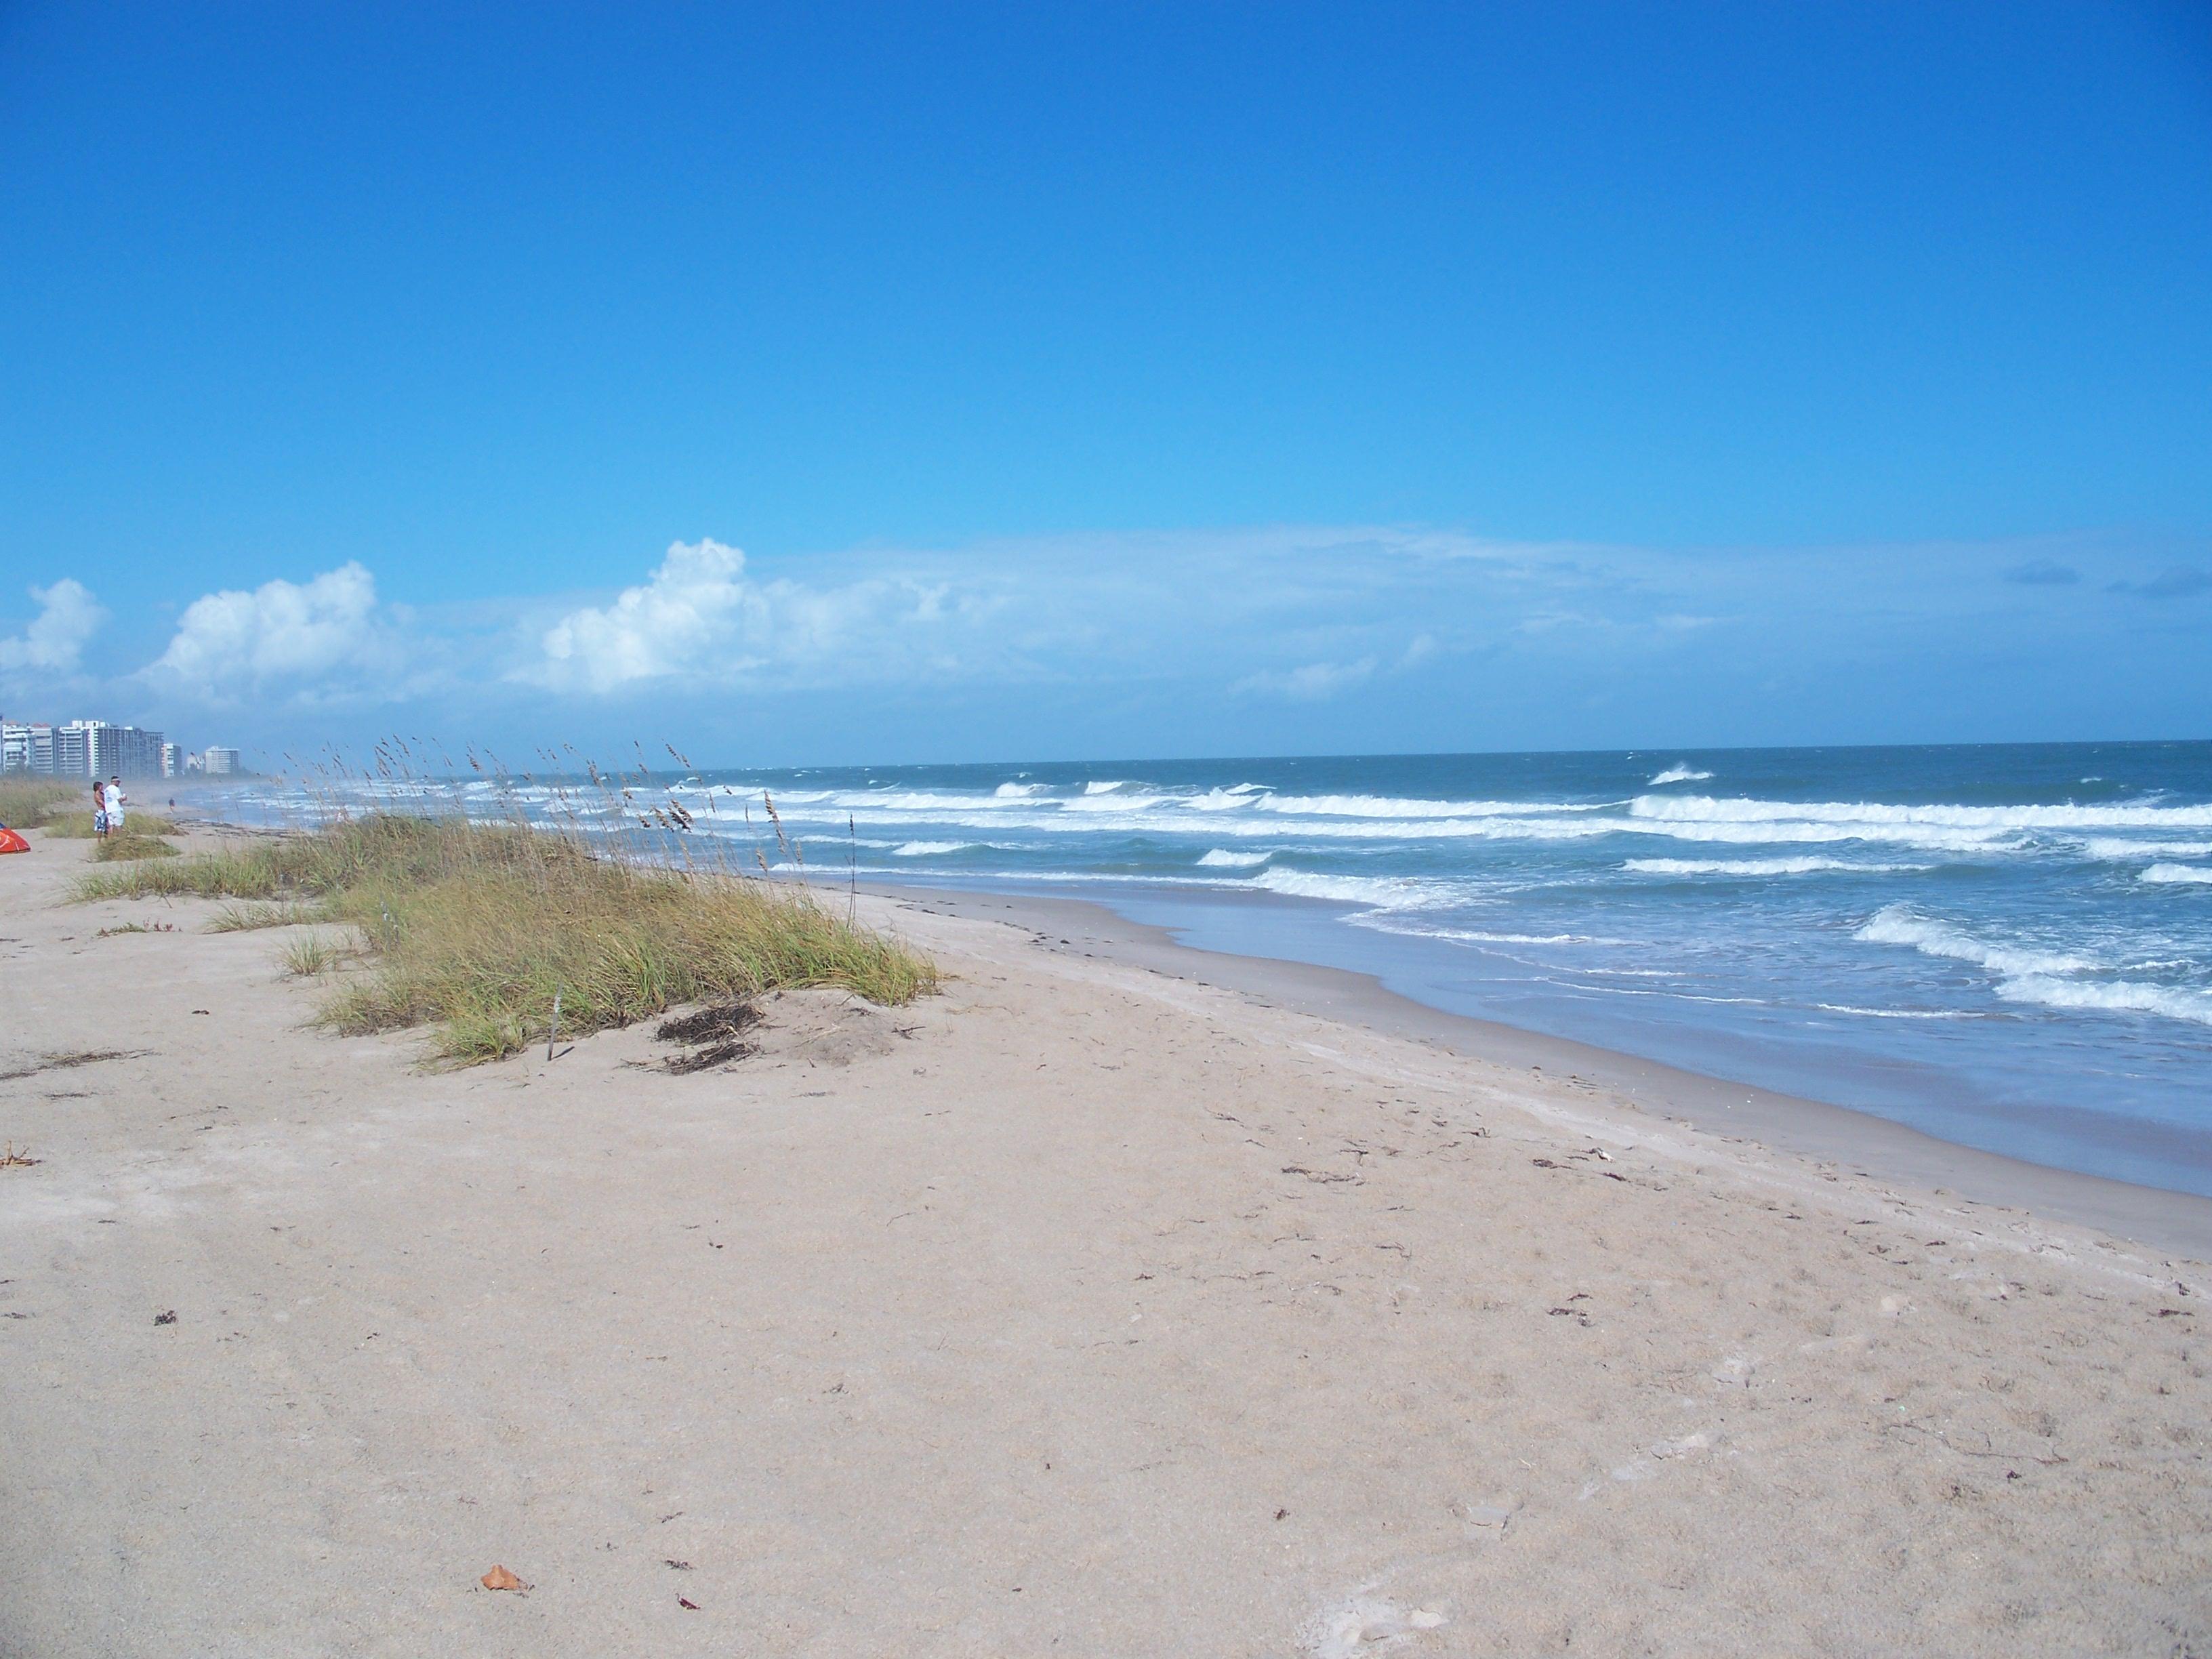 File:Ft Pierce FL Fort Pierce Inlet SP beach01.jpg